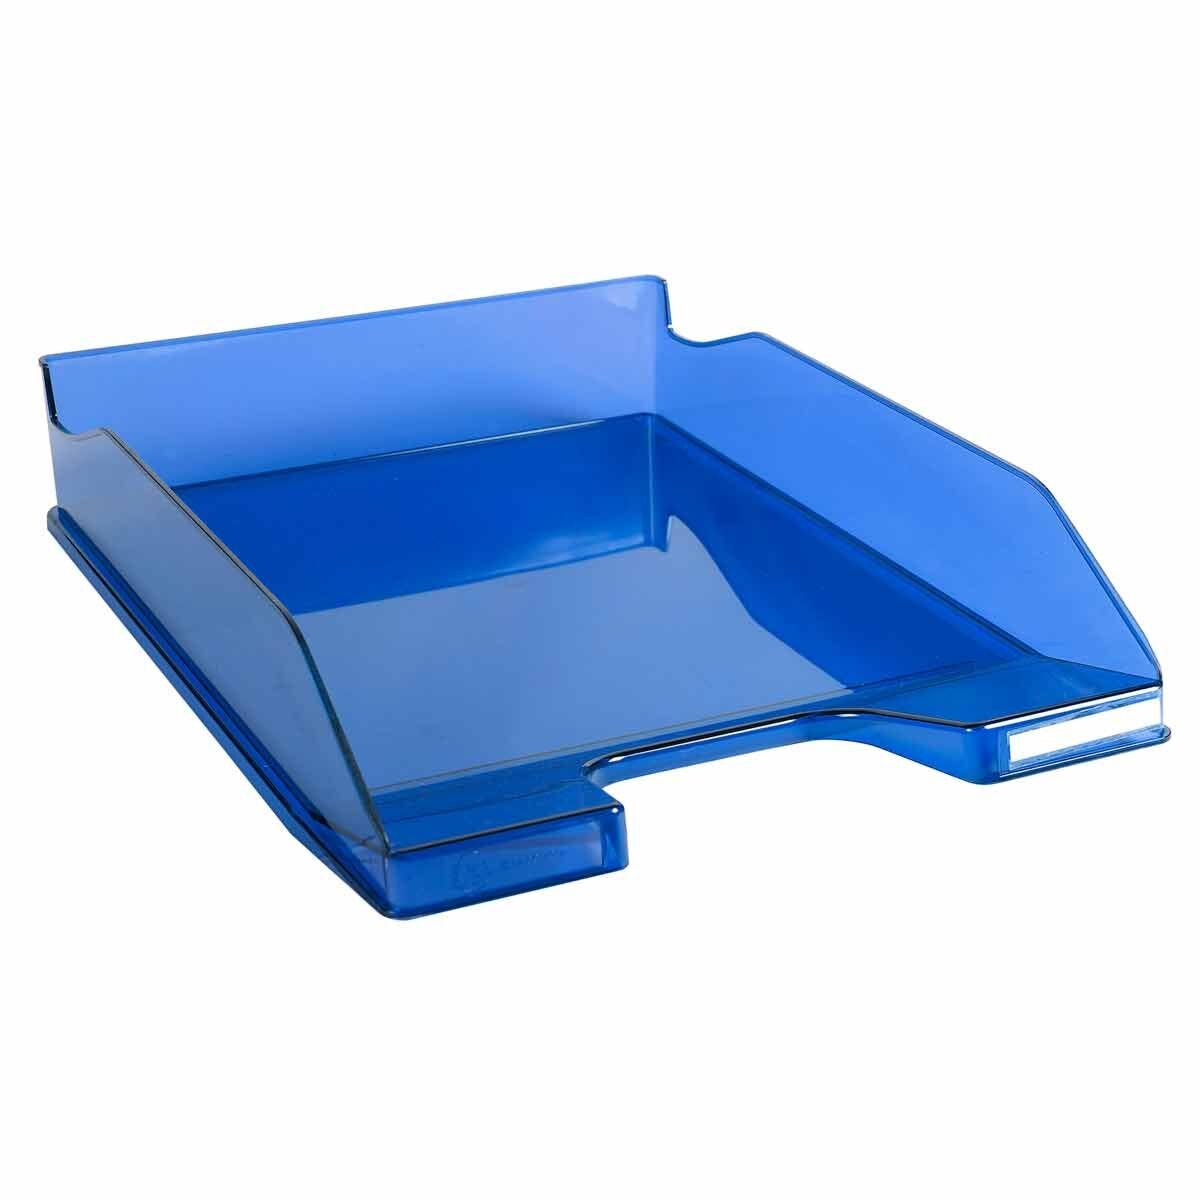 Exacompta Office Letter Tray Midi Combo Pack of 6 Translucent Gloss Blue